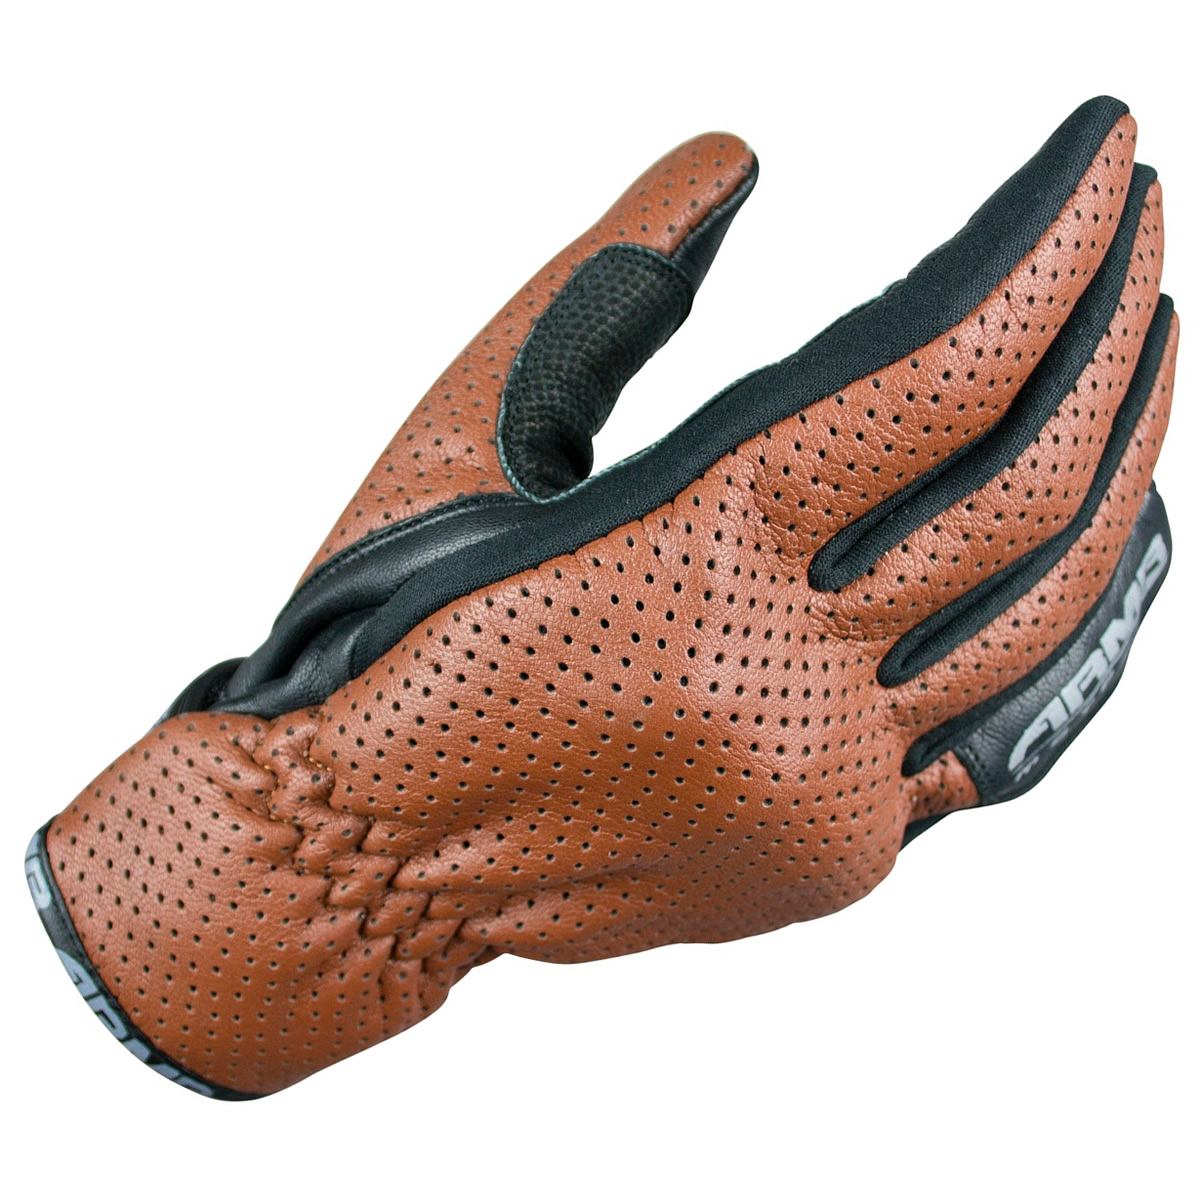 Motorcycle gloves cruiser - Armr Moto Shl435 Leather Motorcycle Gloves Cruiser Motorbike